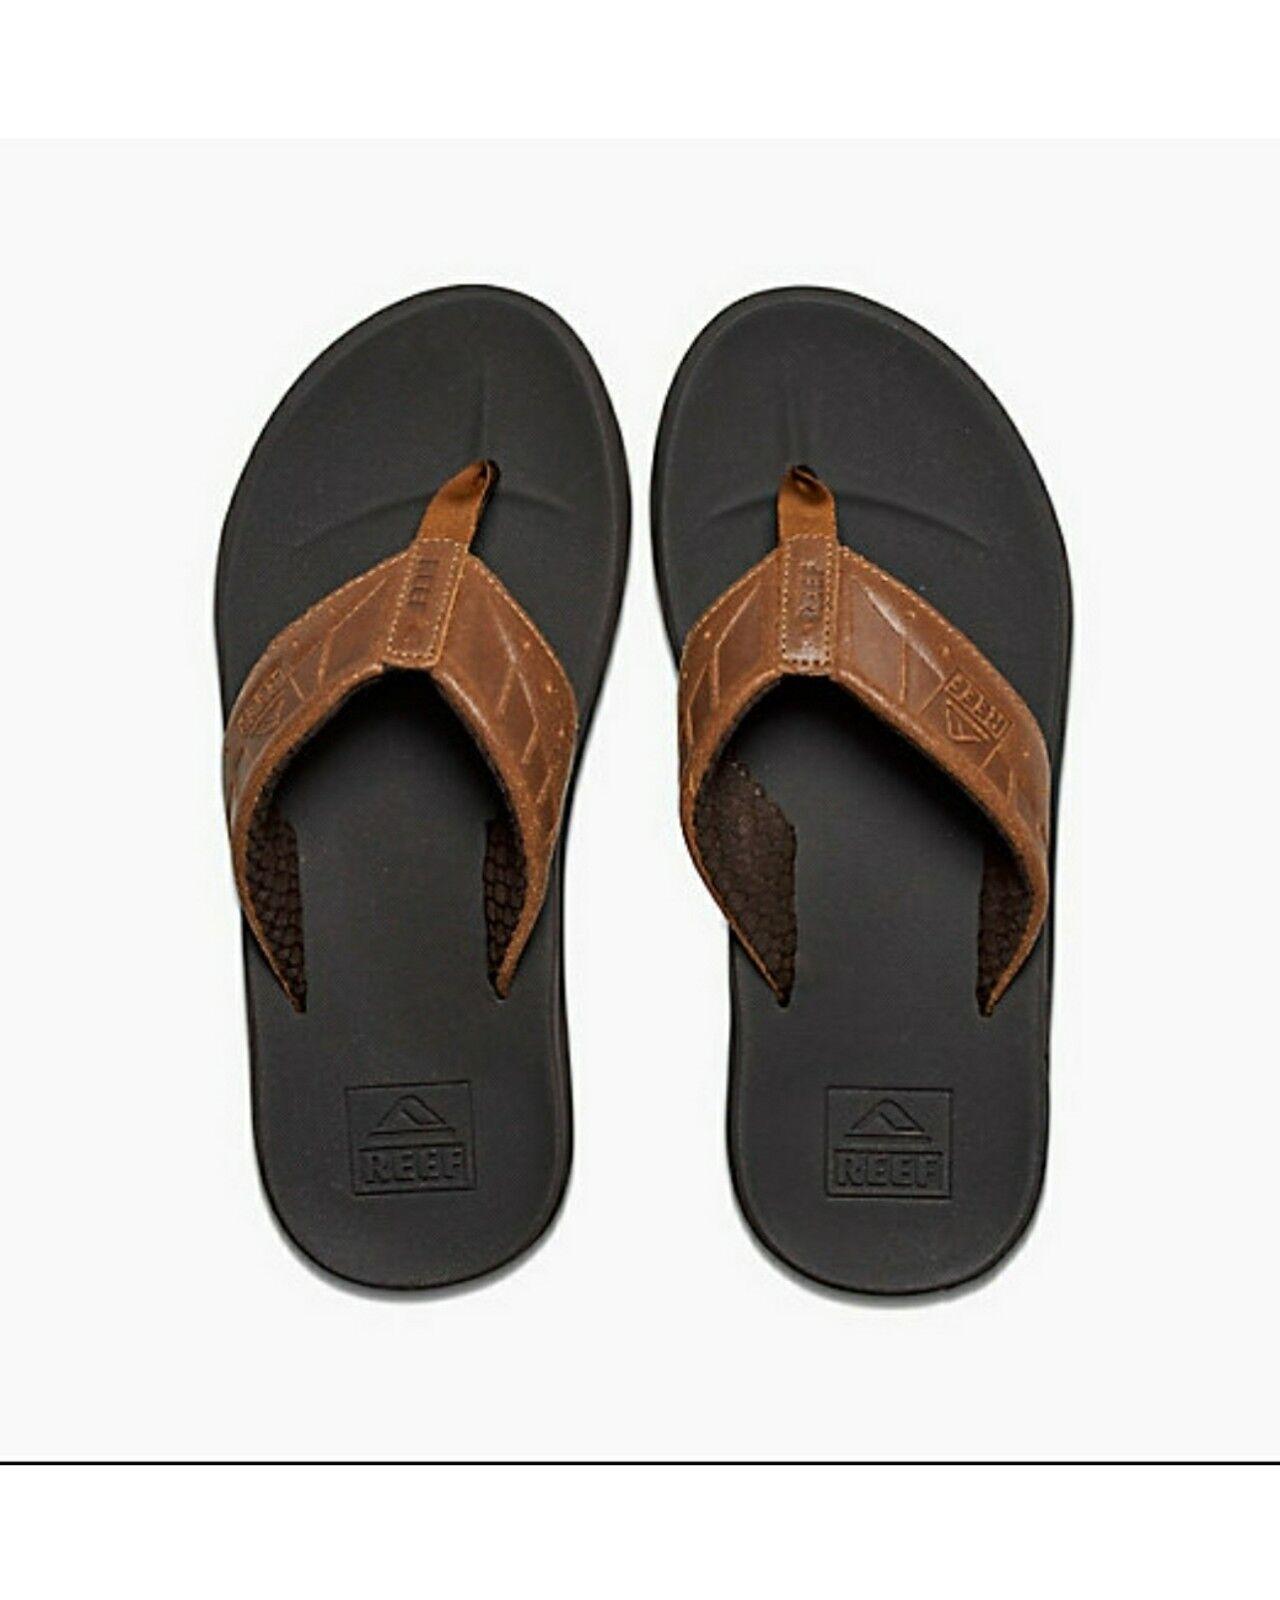 REEF Shoes, Phantom Print Sandals